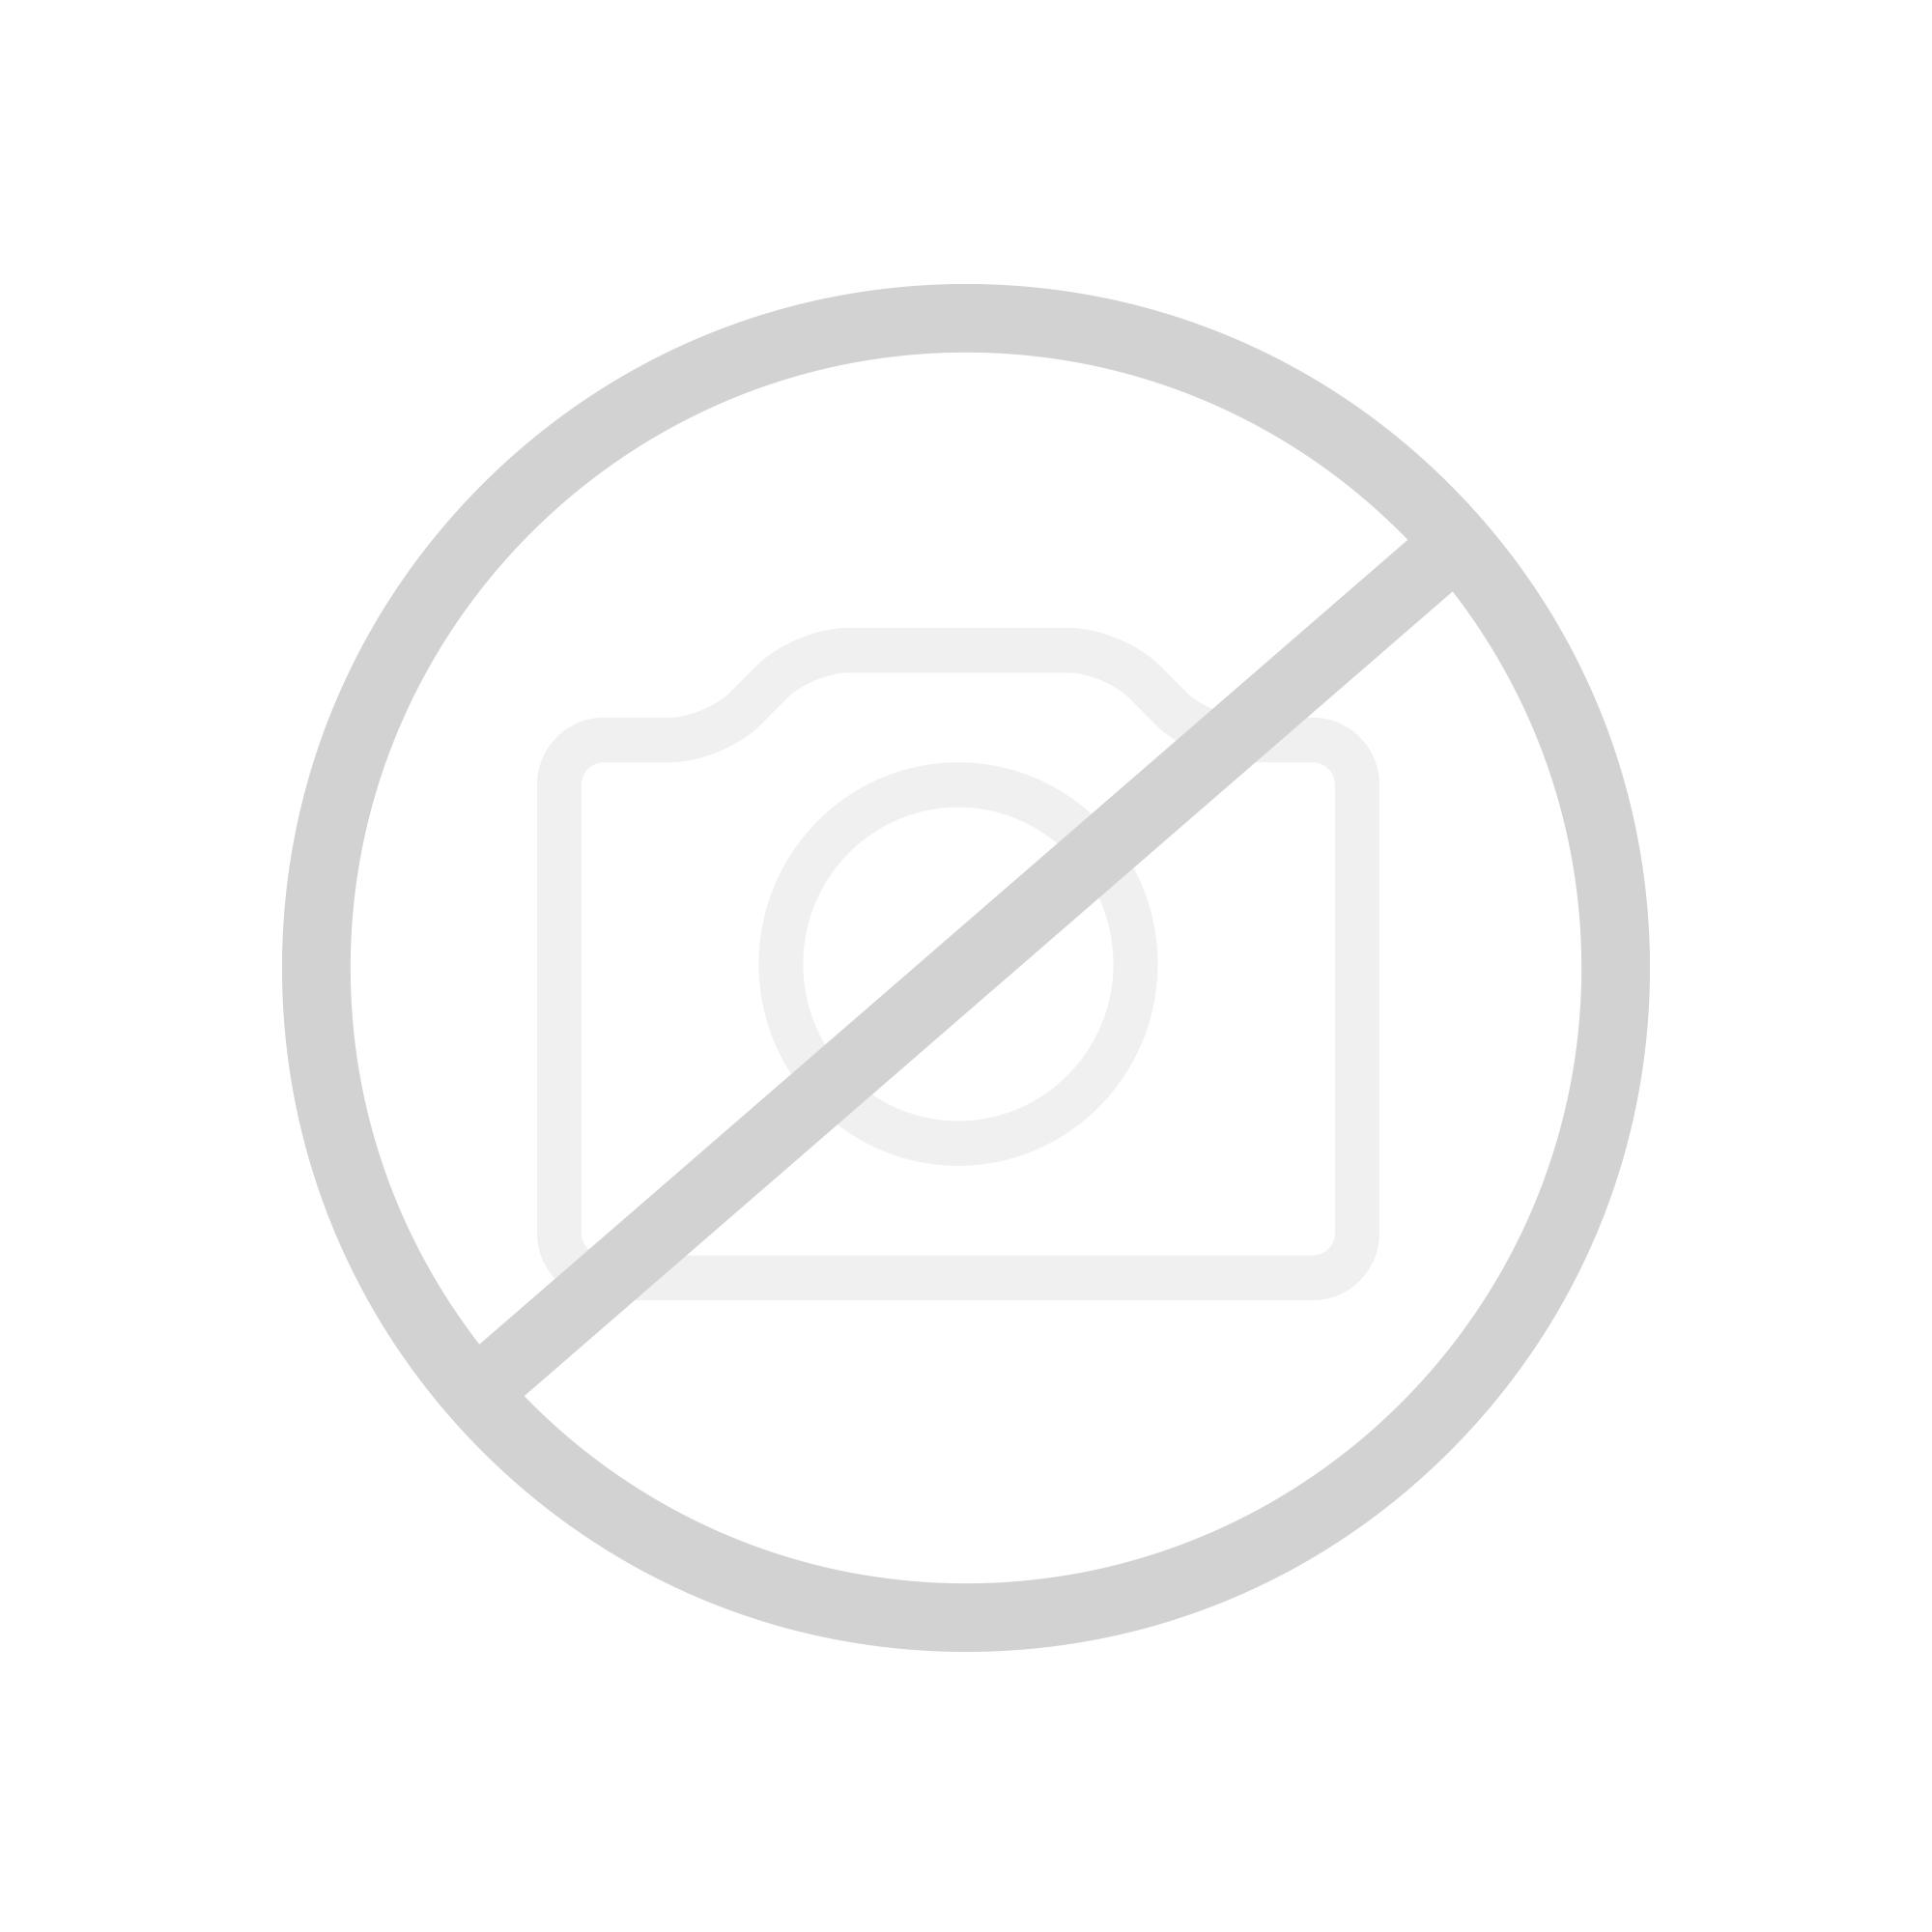 tellkamp neon freistehende oval badewanne 0100 089 a cr reuter. Black Bedroom Furniture Sets. Home Design Ideas